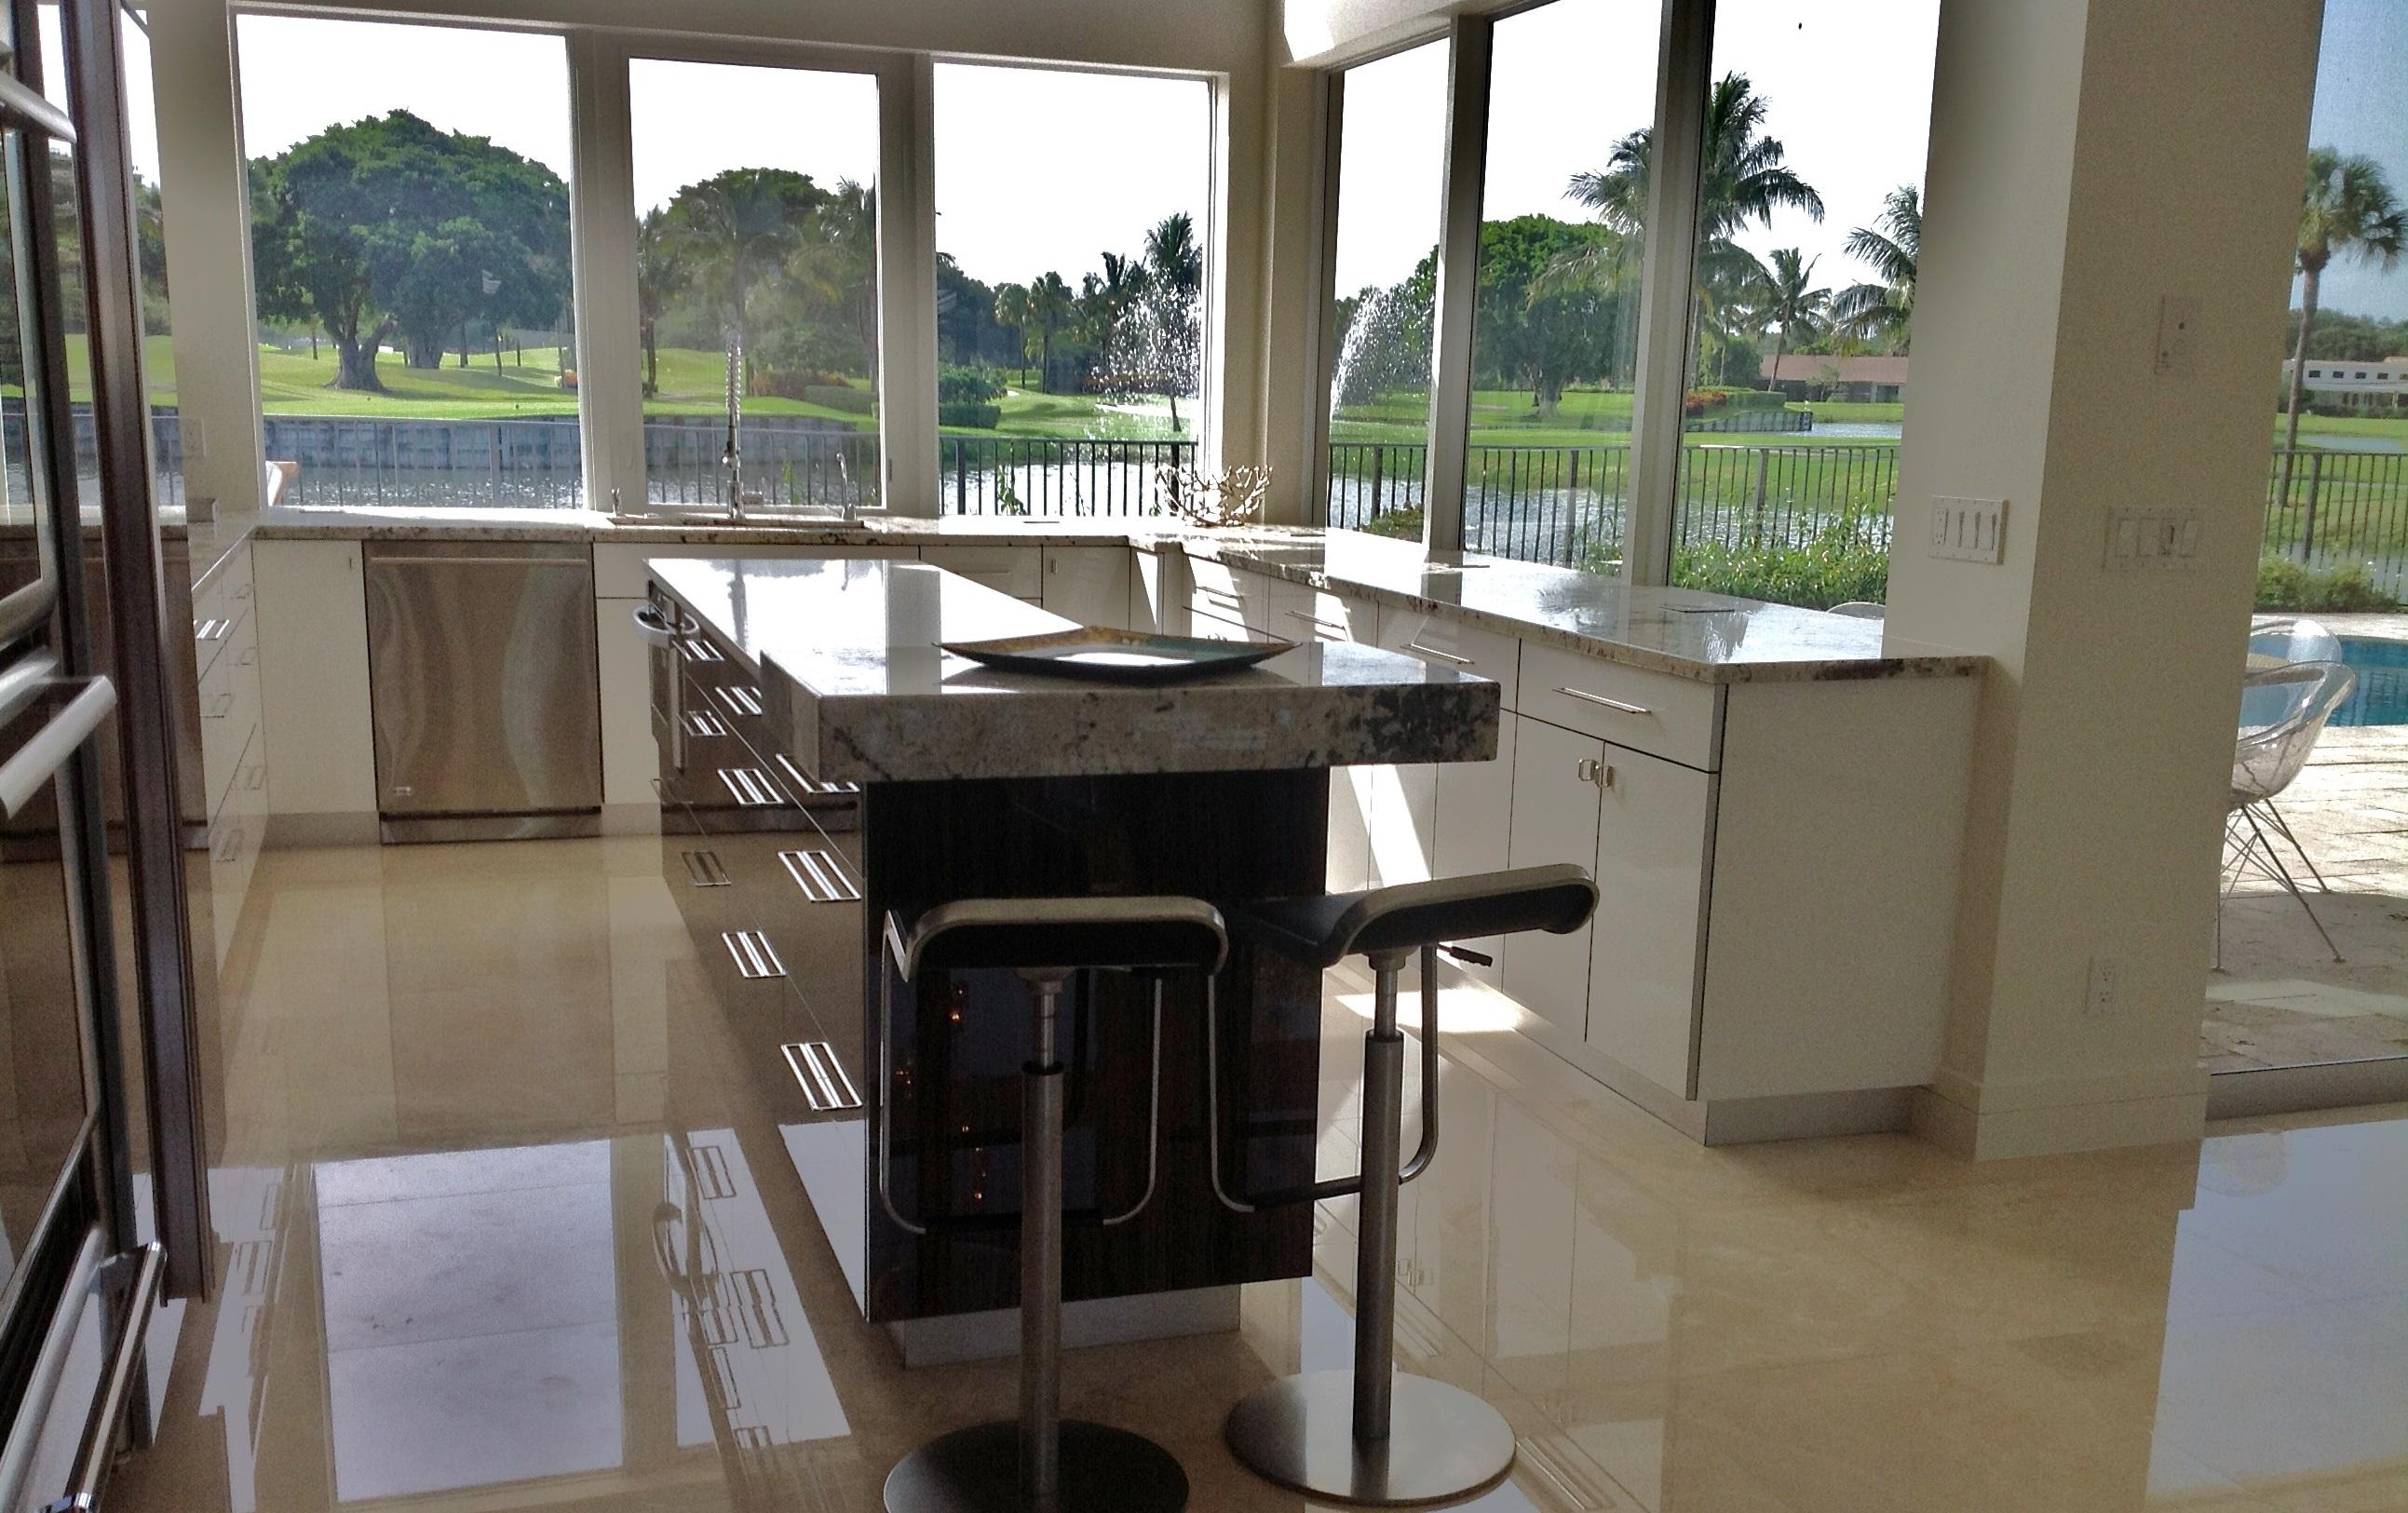 Boca Raton Kitchen Remodeling By Boca Kitchens Amp Baths